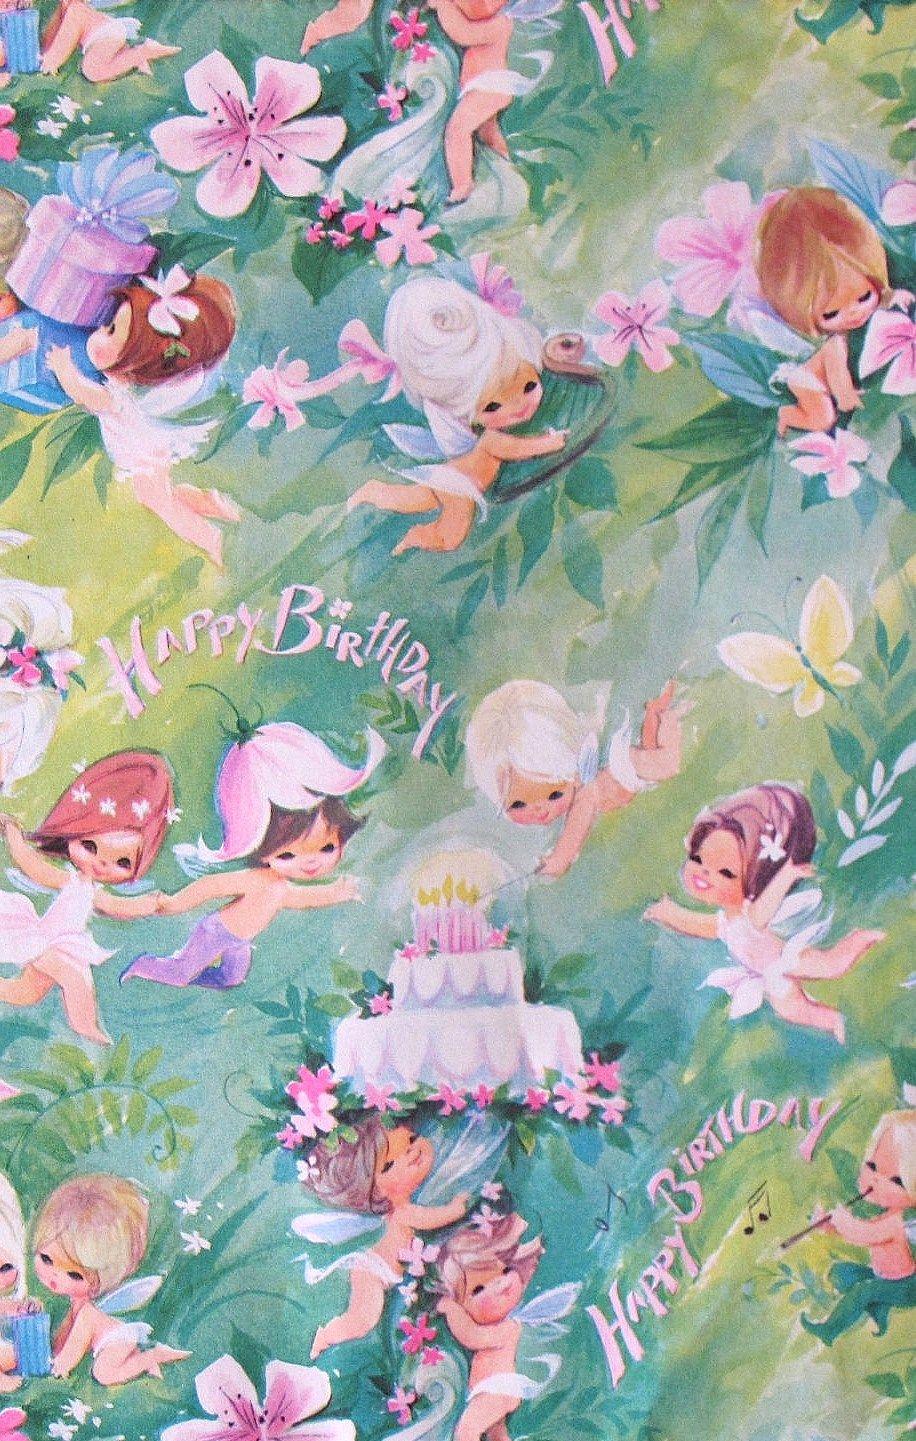 Pin On Art Kinderwhore Lolita Pastel Soft Grunge Aesthetic